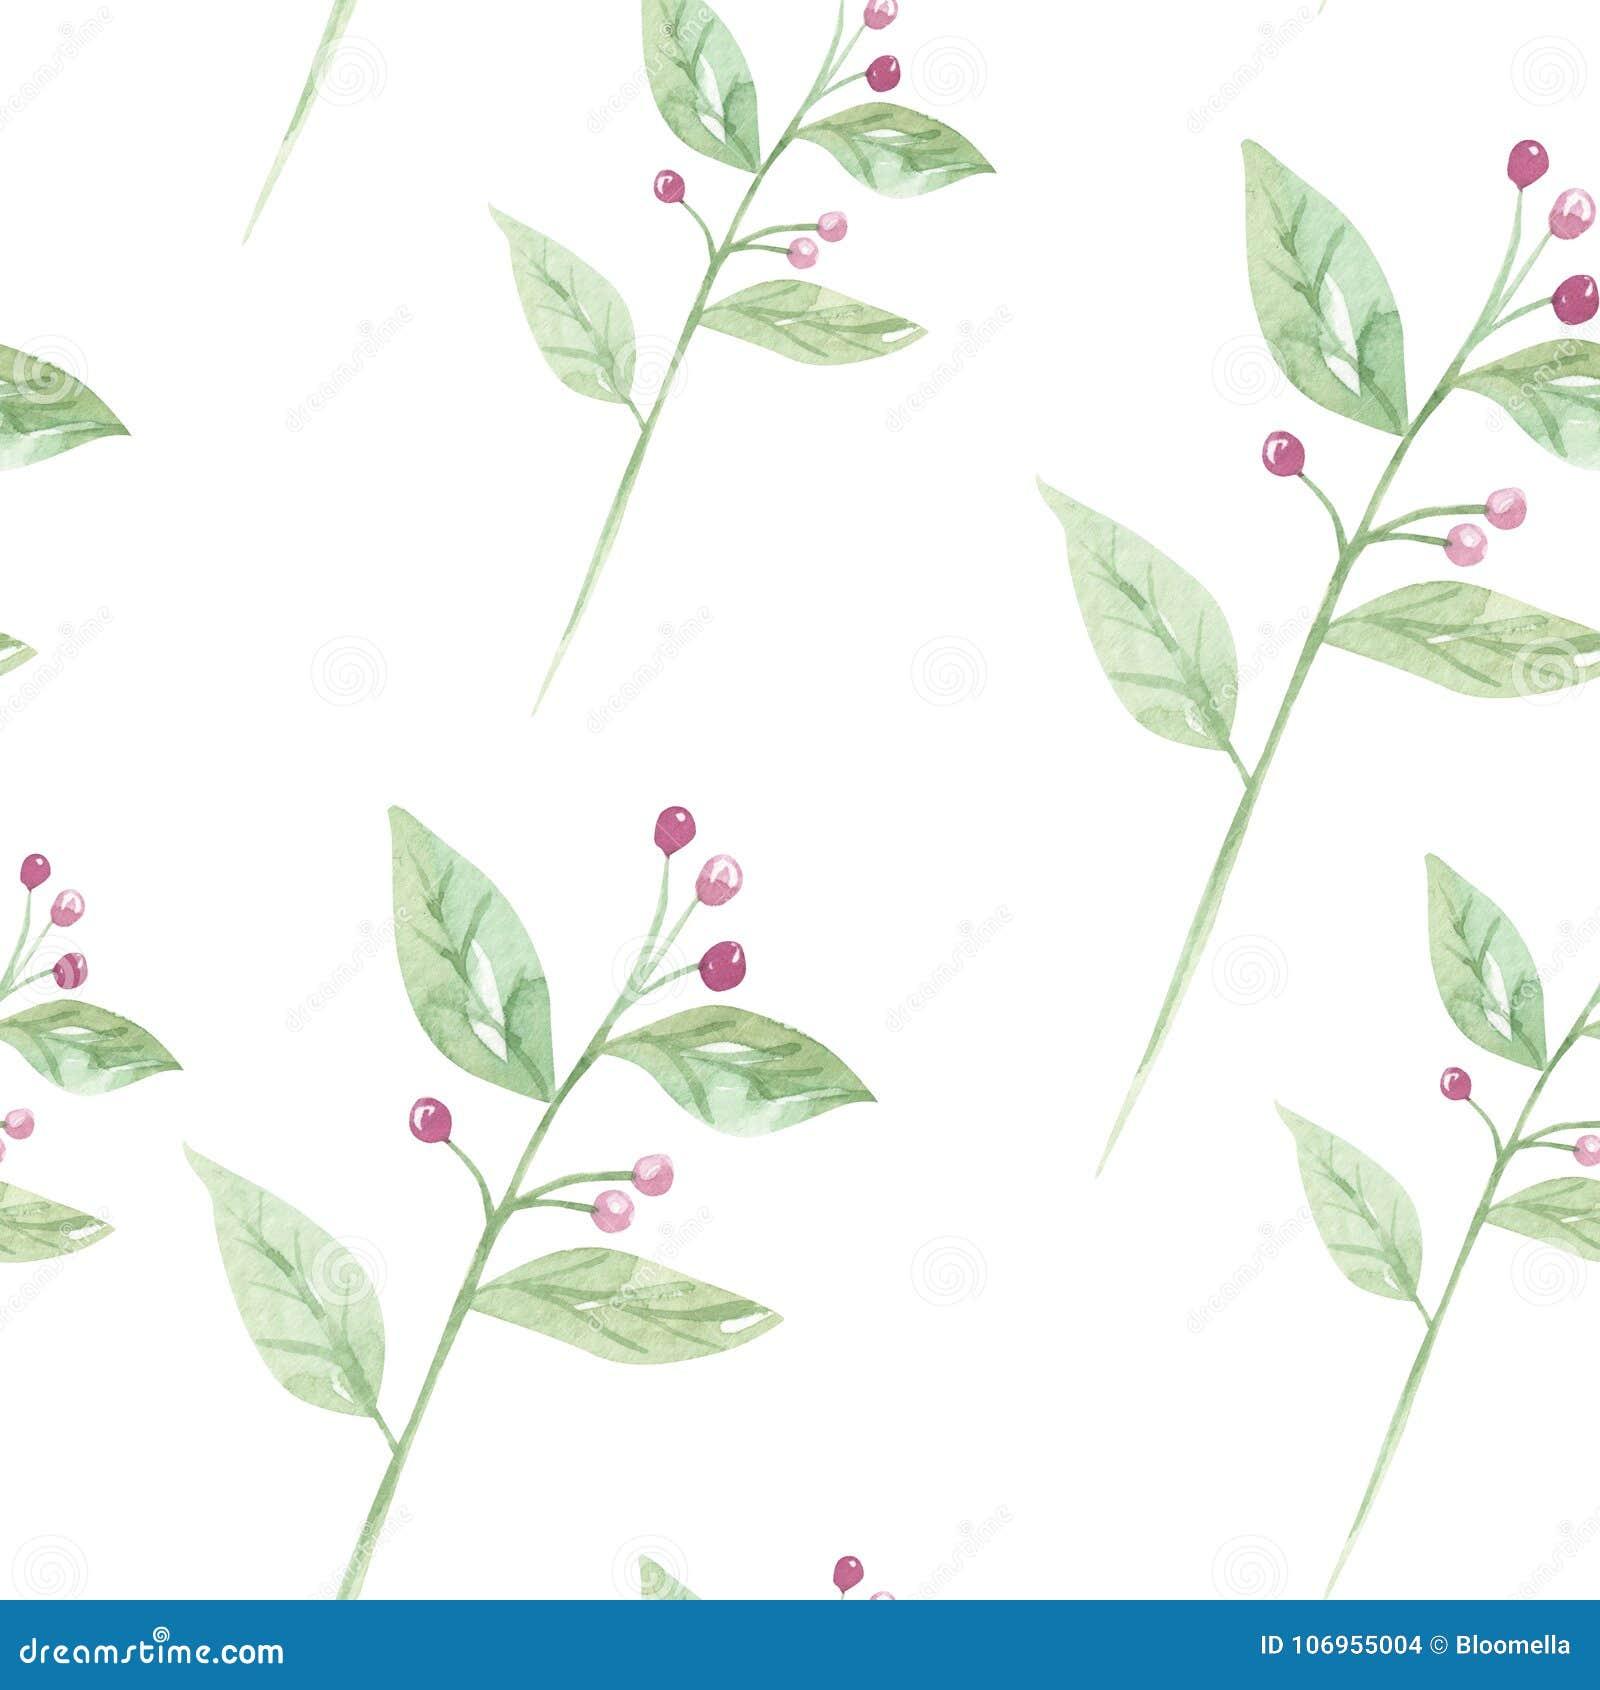 Aquarell Blumen Hochzeit Lasst Blattfeder Sommer Nahtloses Muster